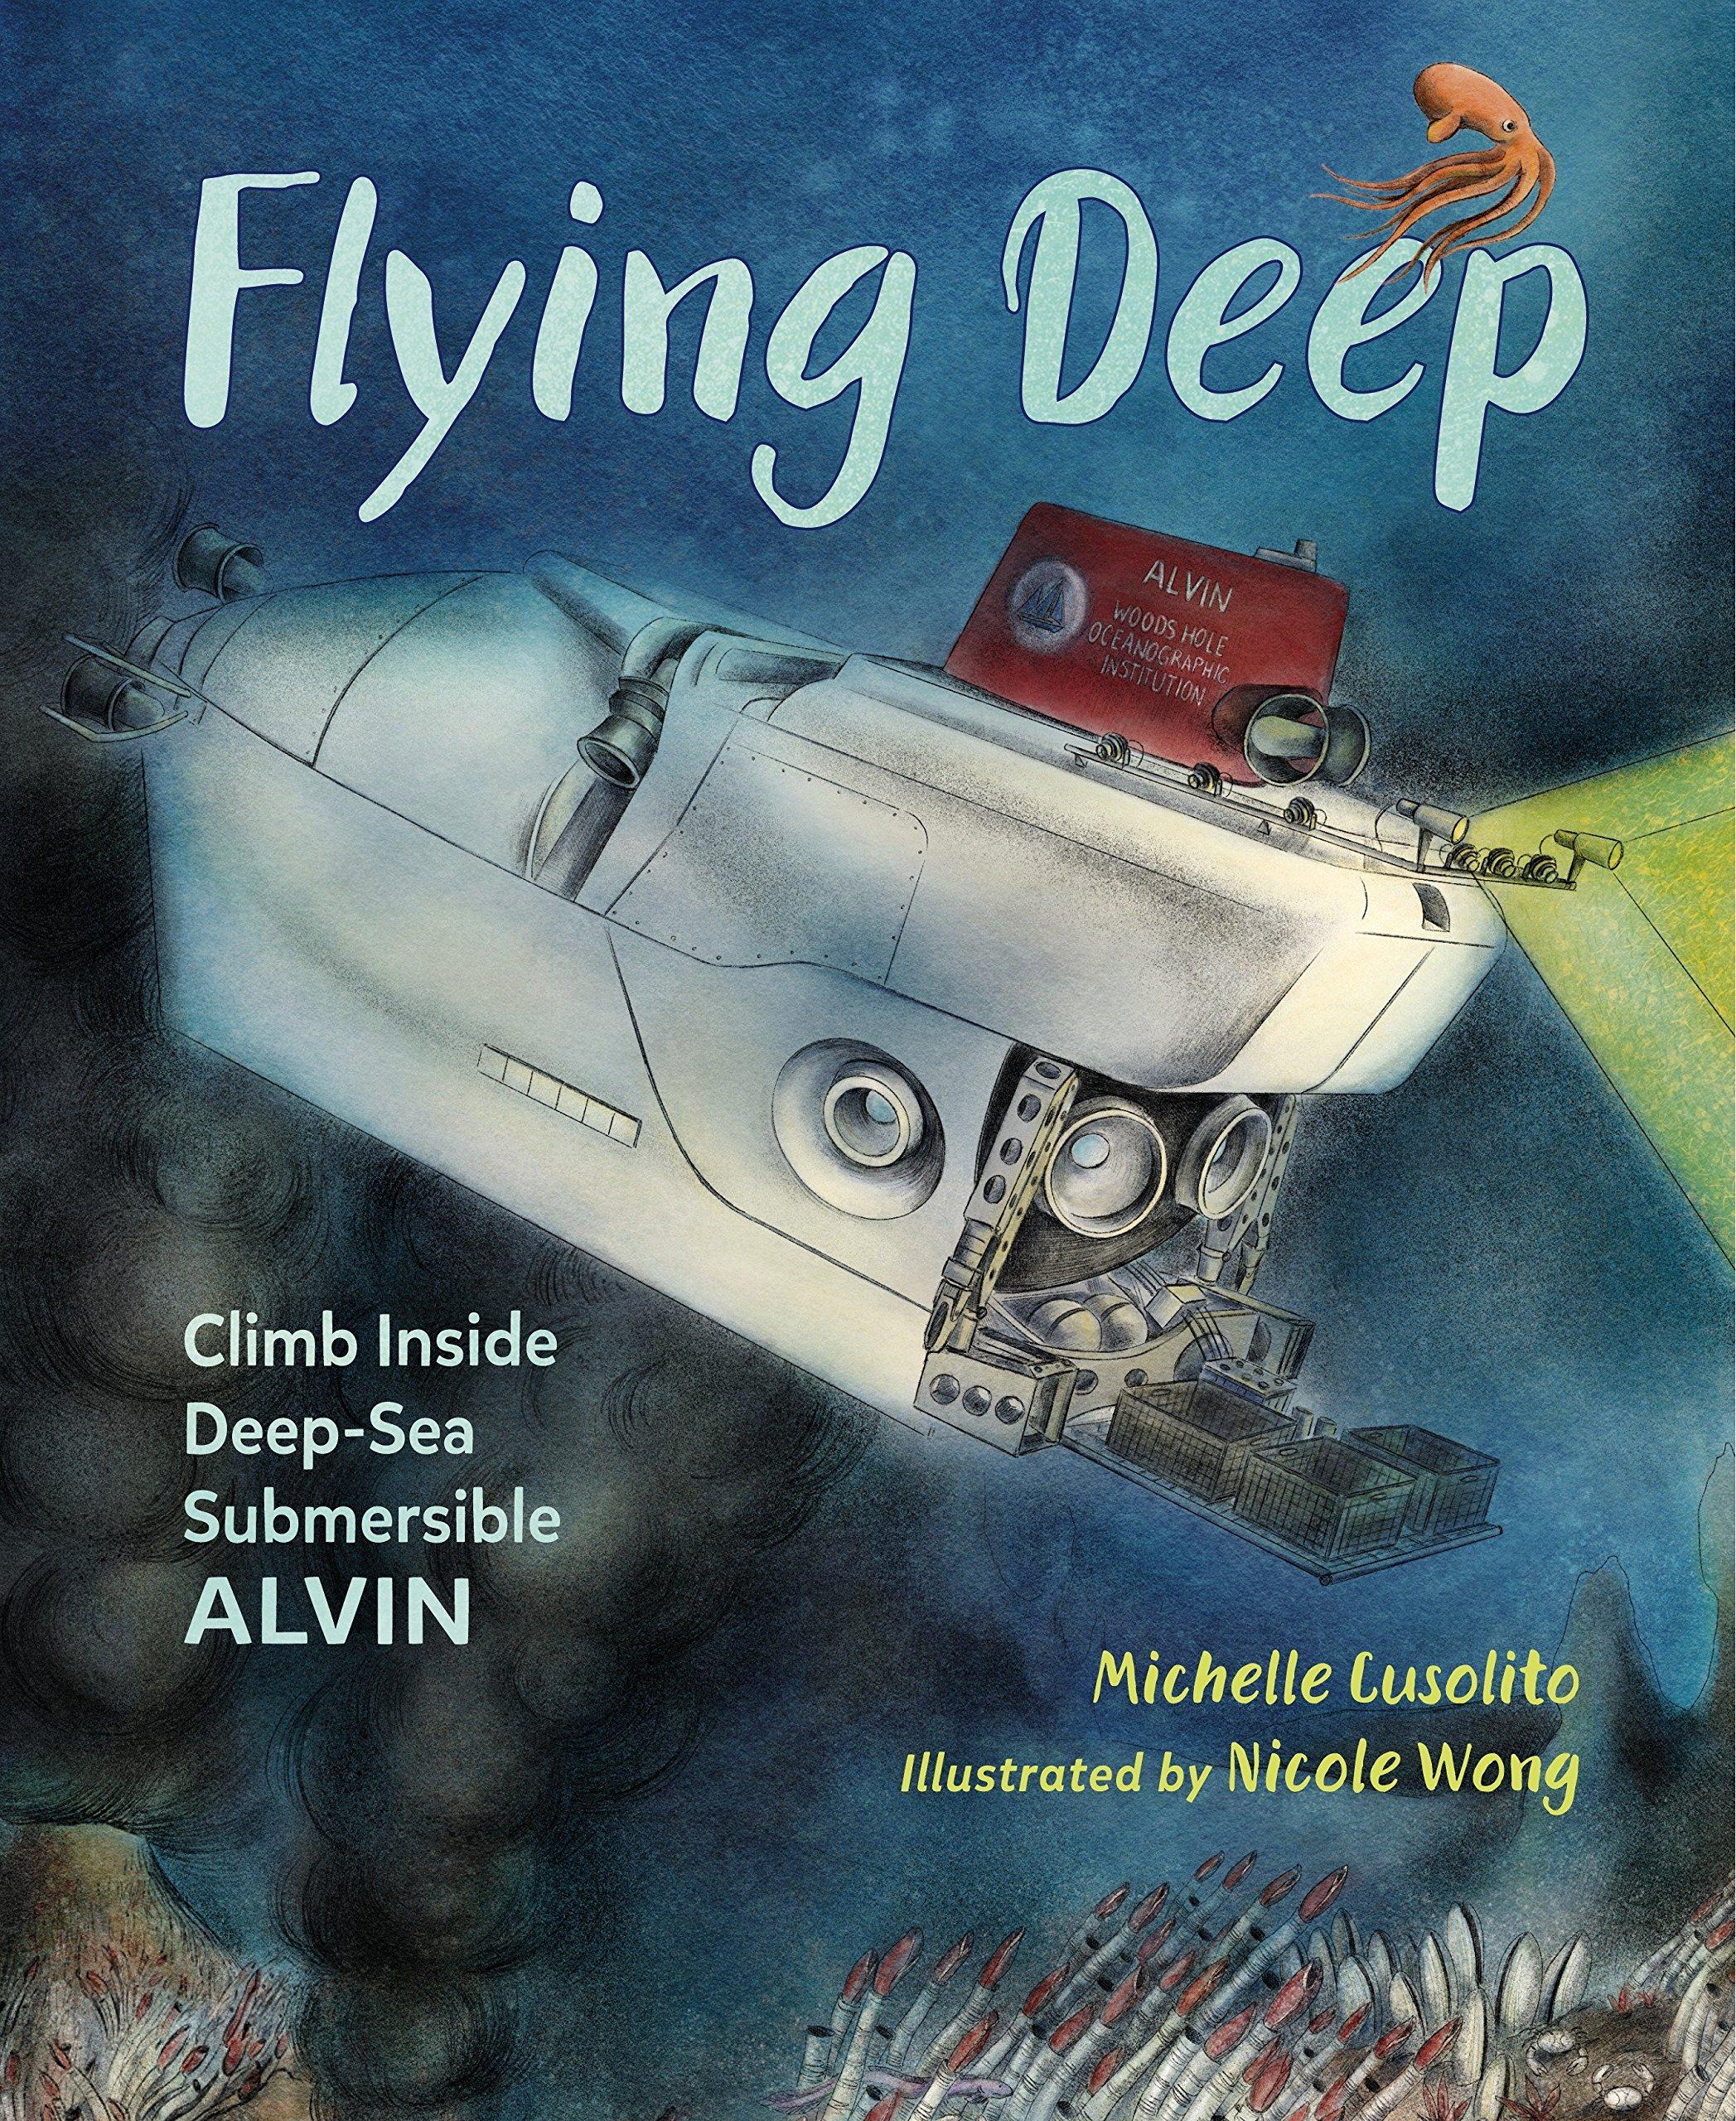 Download Flying Deep: Climb Inside Deep-Sea Submersible Alvin ebook